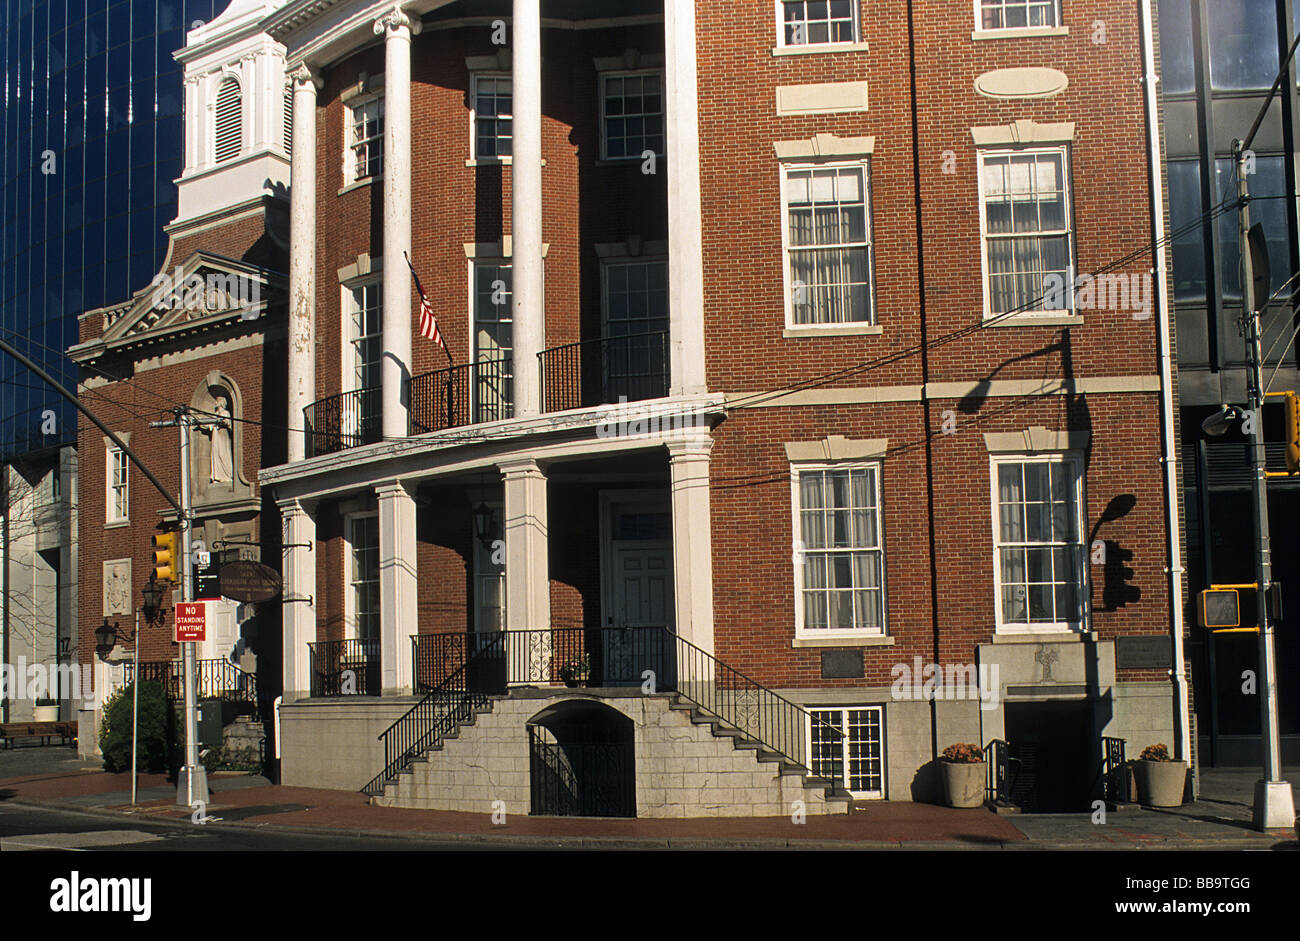 New York, James Watson House, now Rectory of the Shrine of Elizabeth Ann Seton. - Stock Image